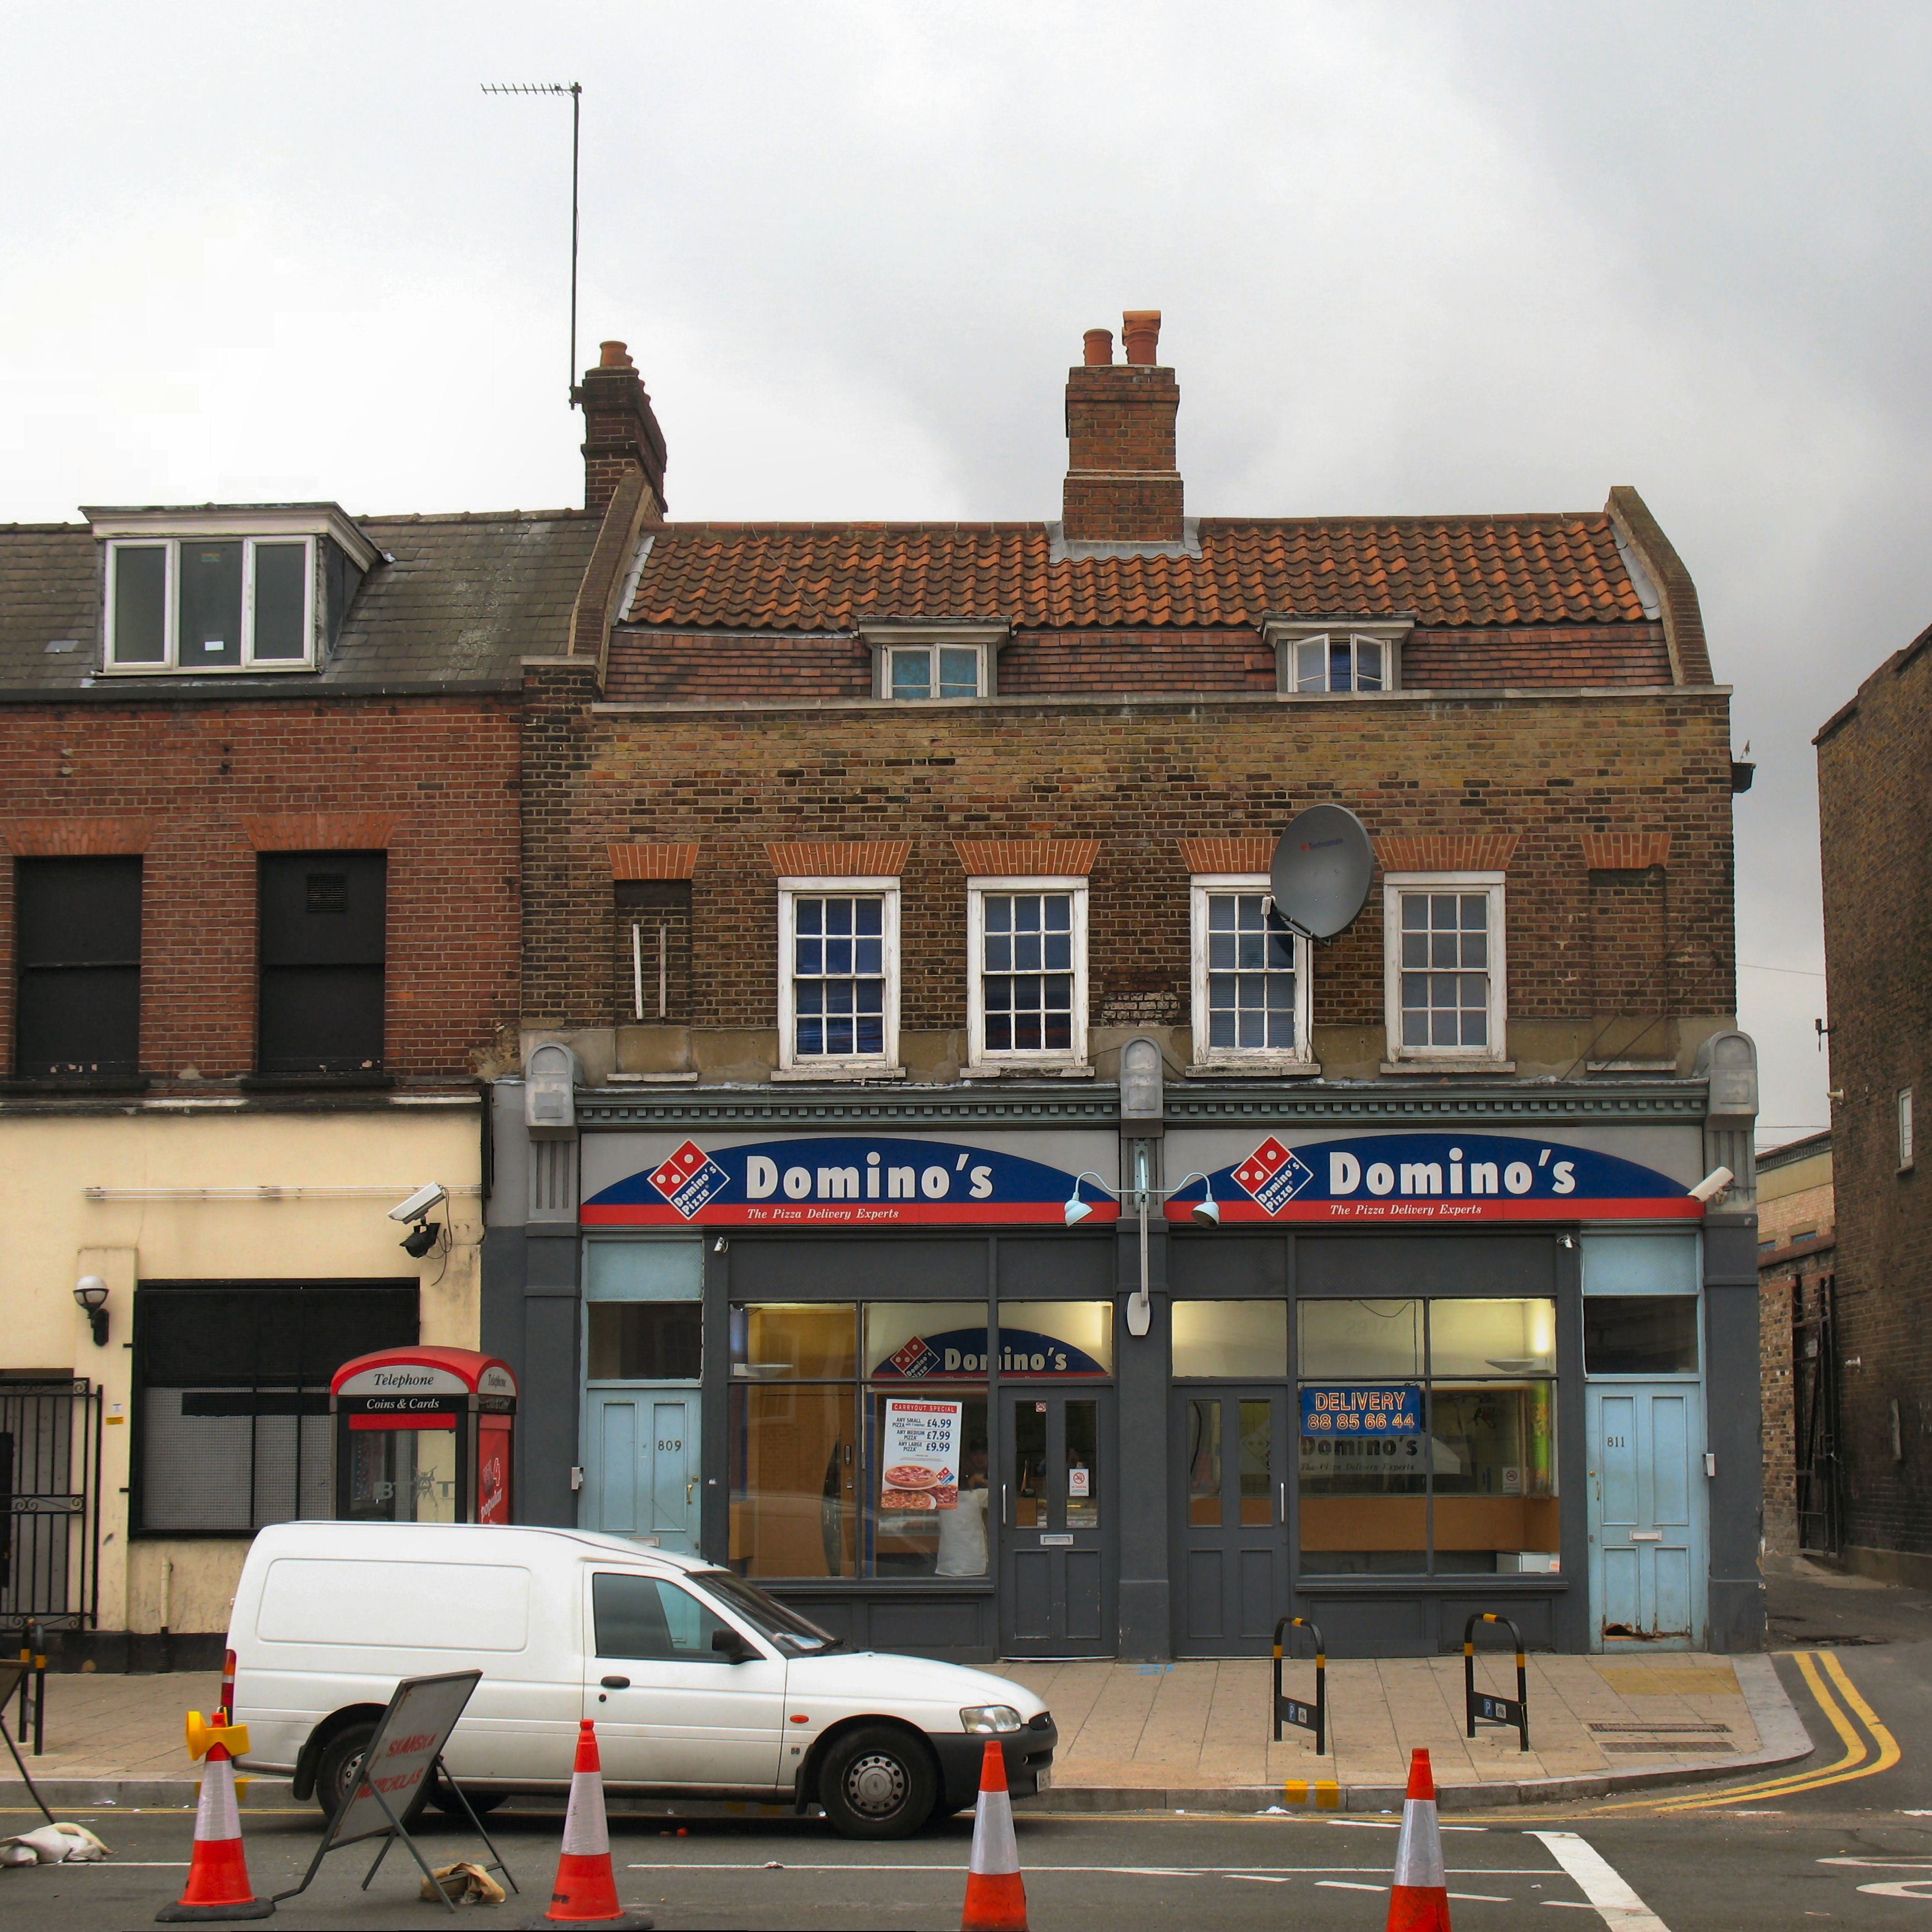 Property For Sale London Under K